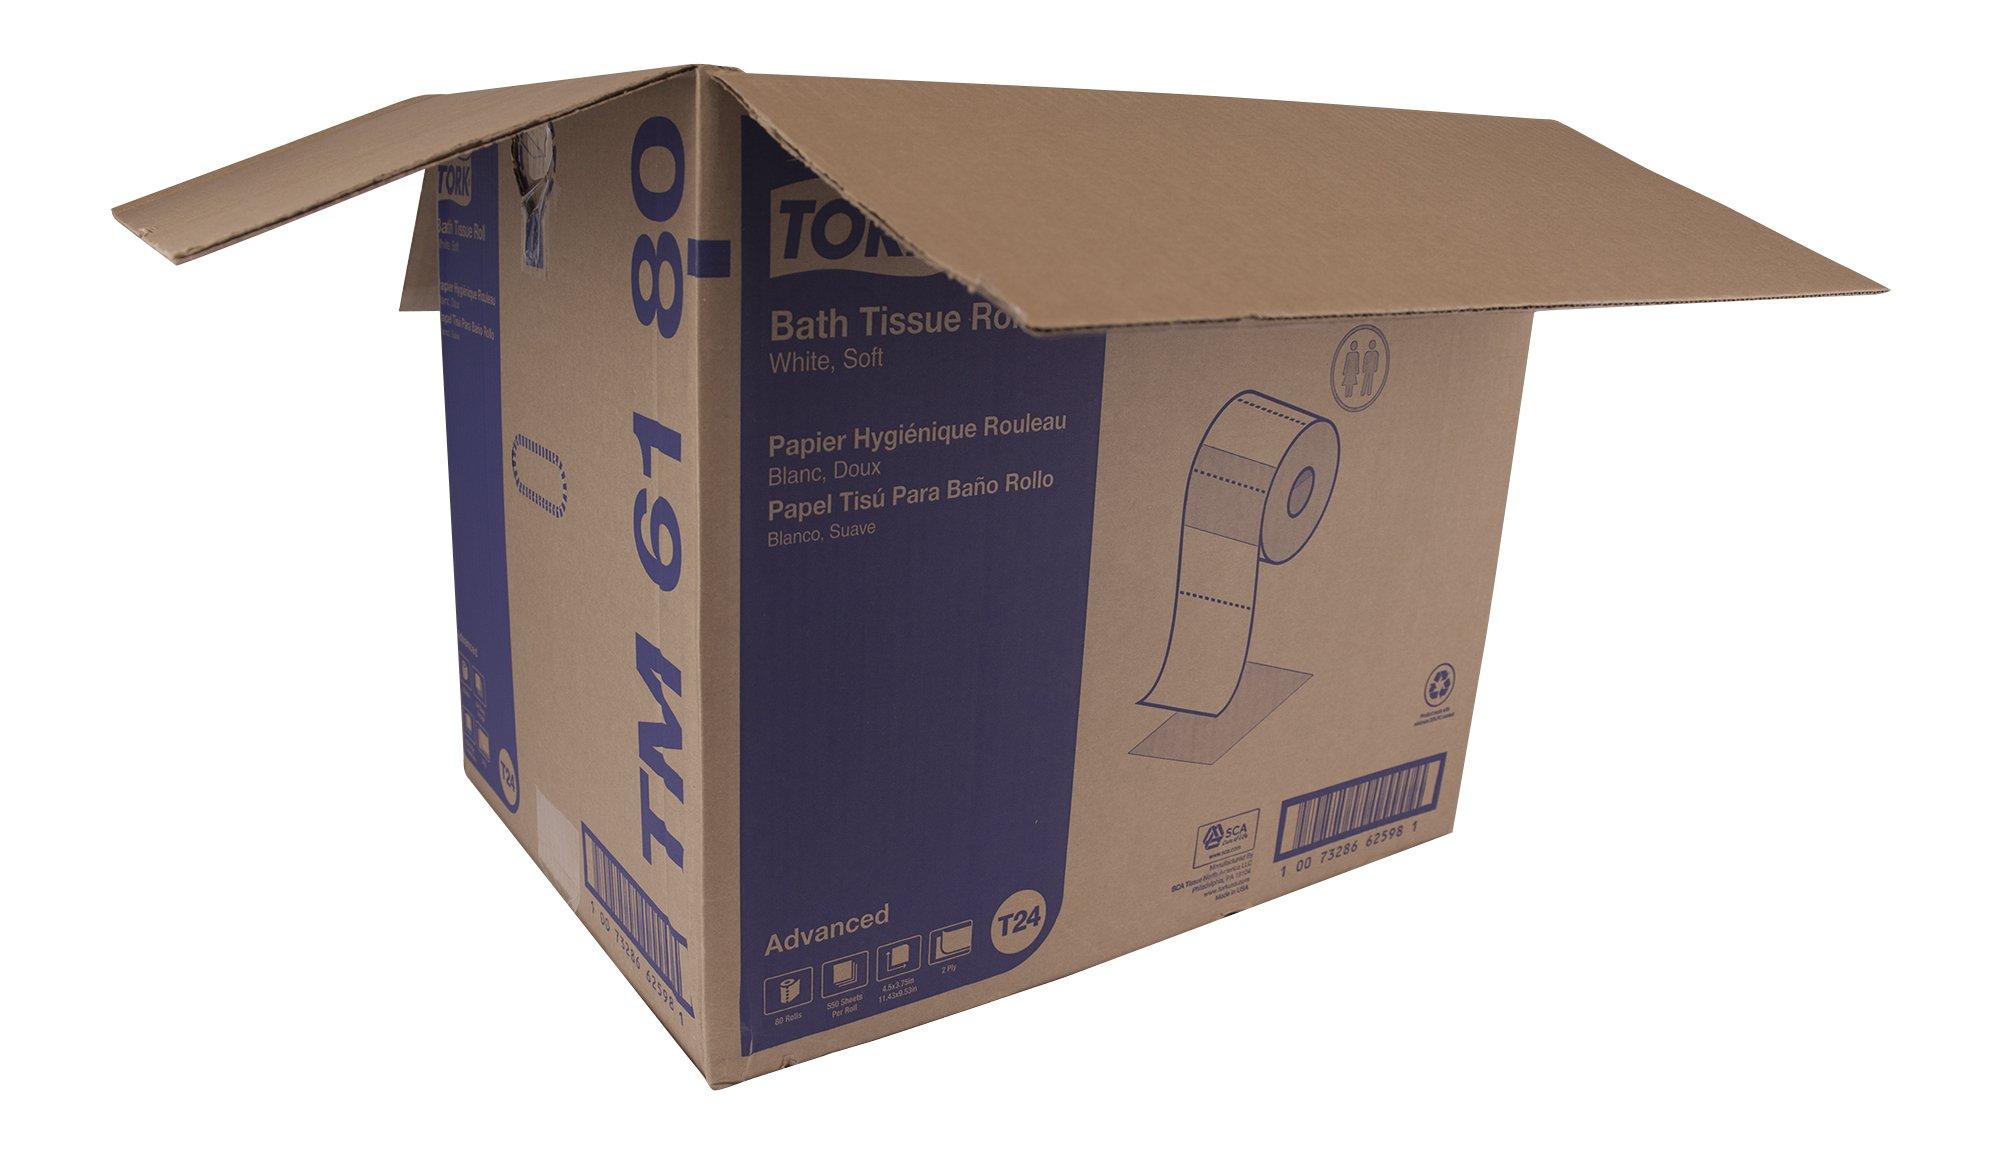 Tork Advanced TM6180 Soft Bath Tissue - open case